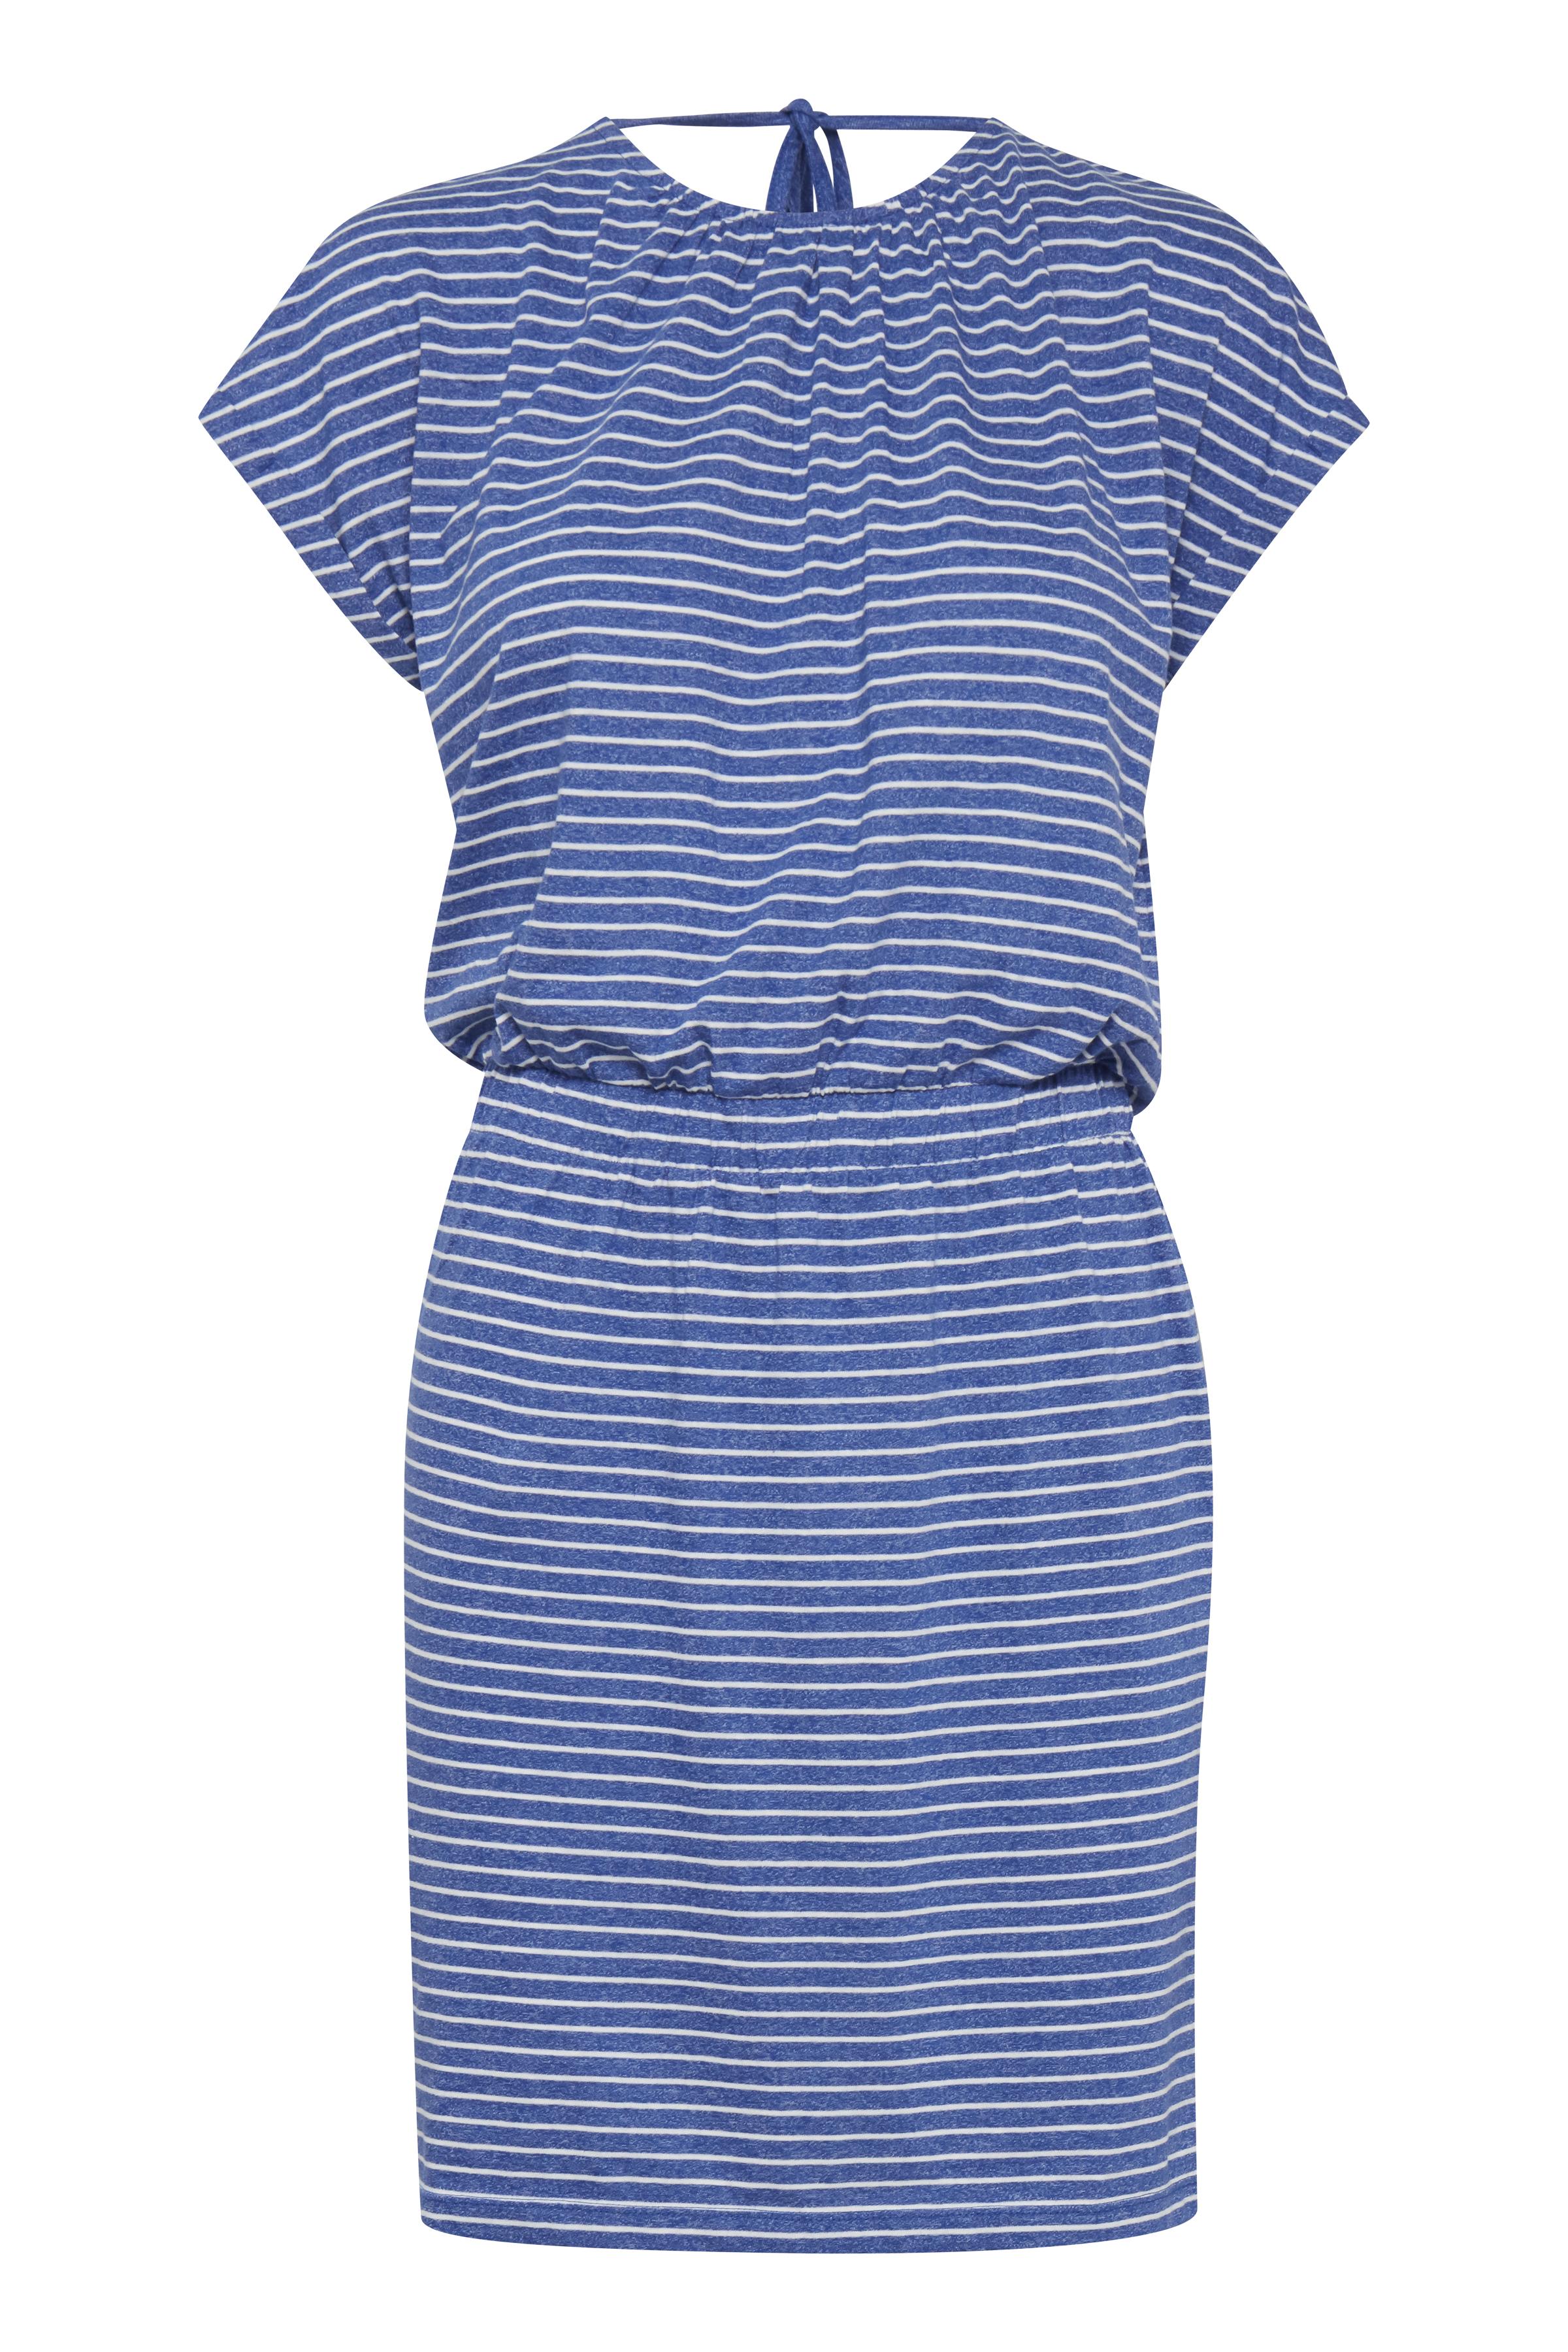 Small Stripe Mazarine Blue Jerseykjole – Køb Small Stripe Mazarine Blue Jerseykjole fra str. S-XL her